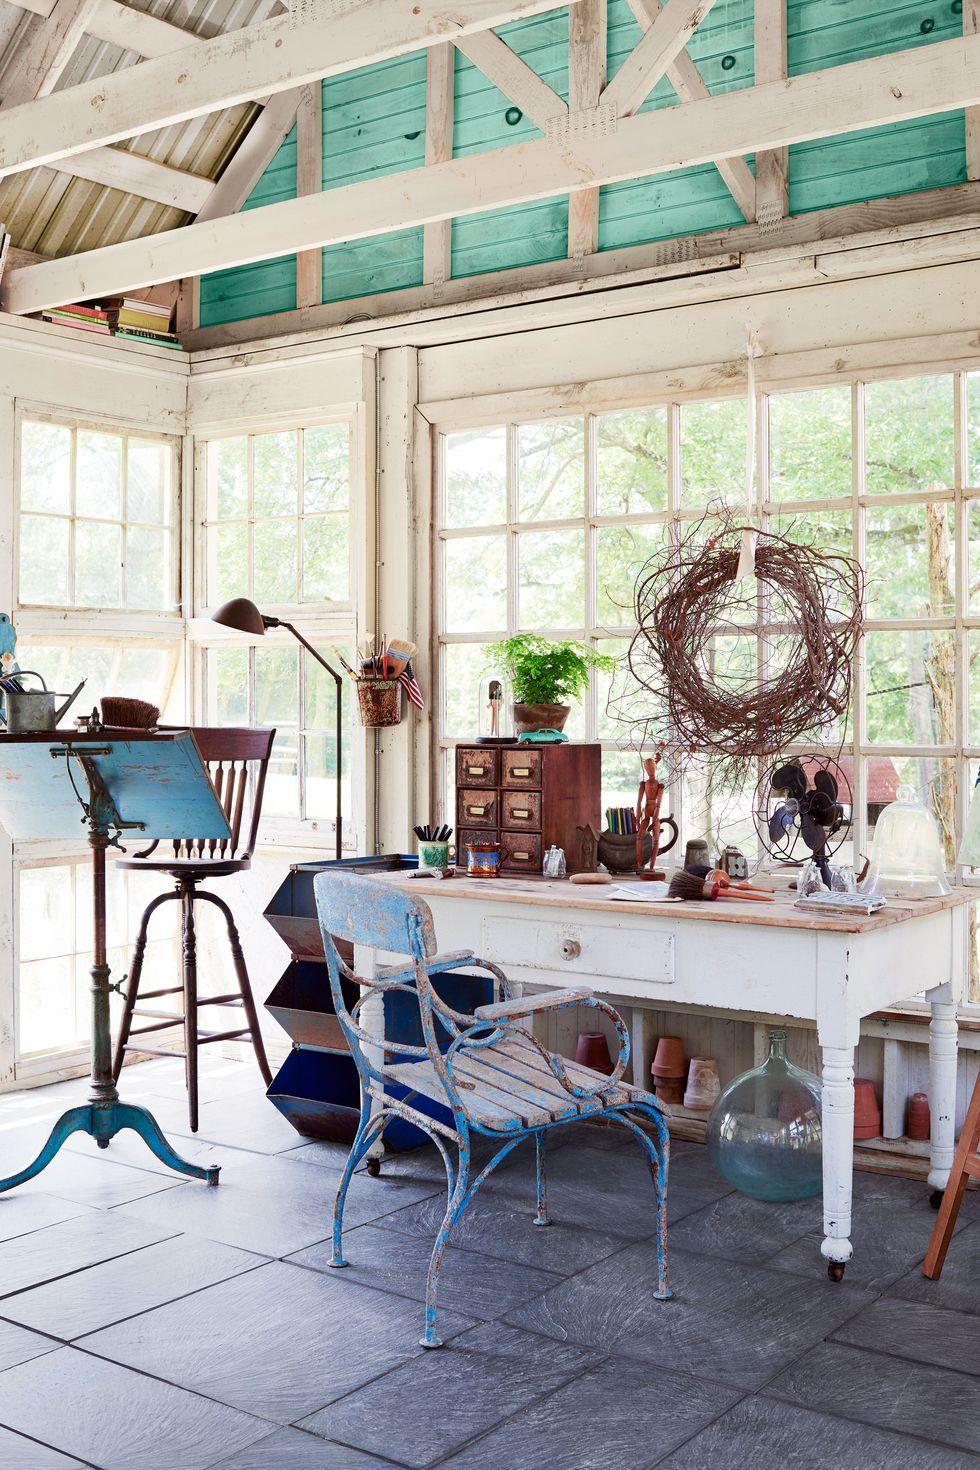 Barbara Adkins/ Country Living